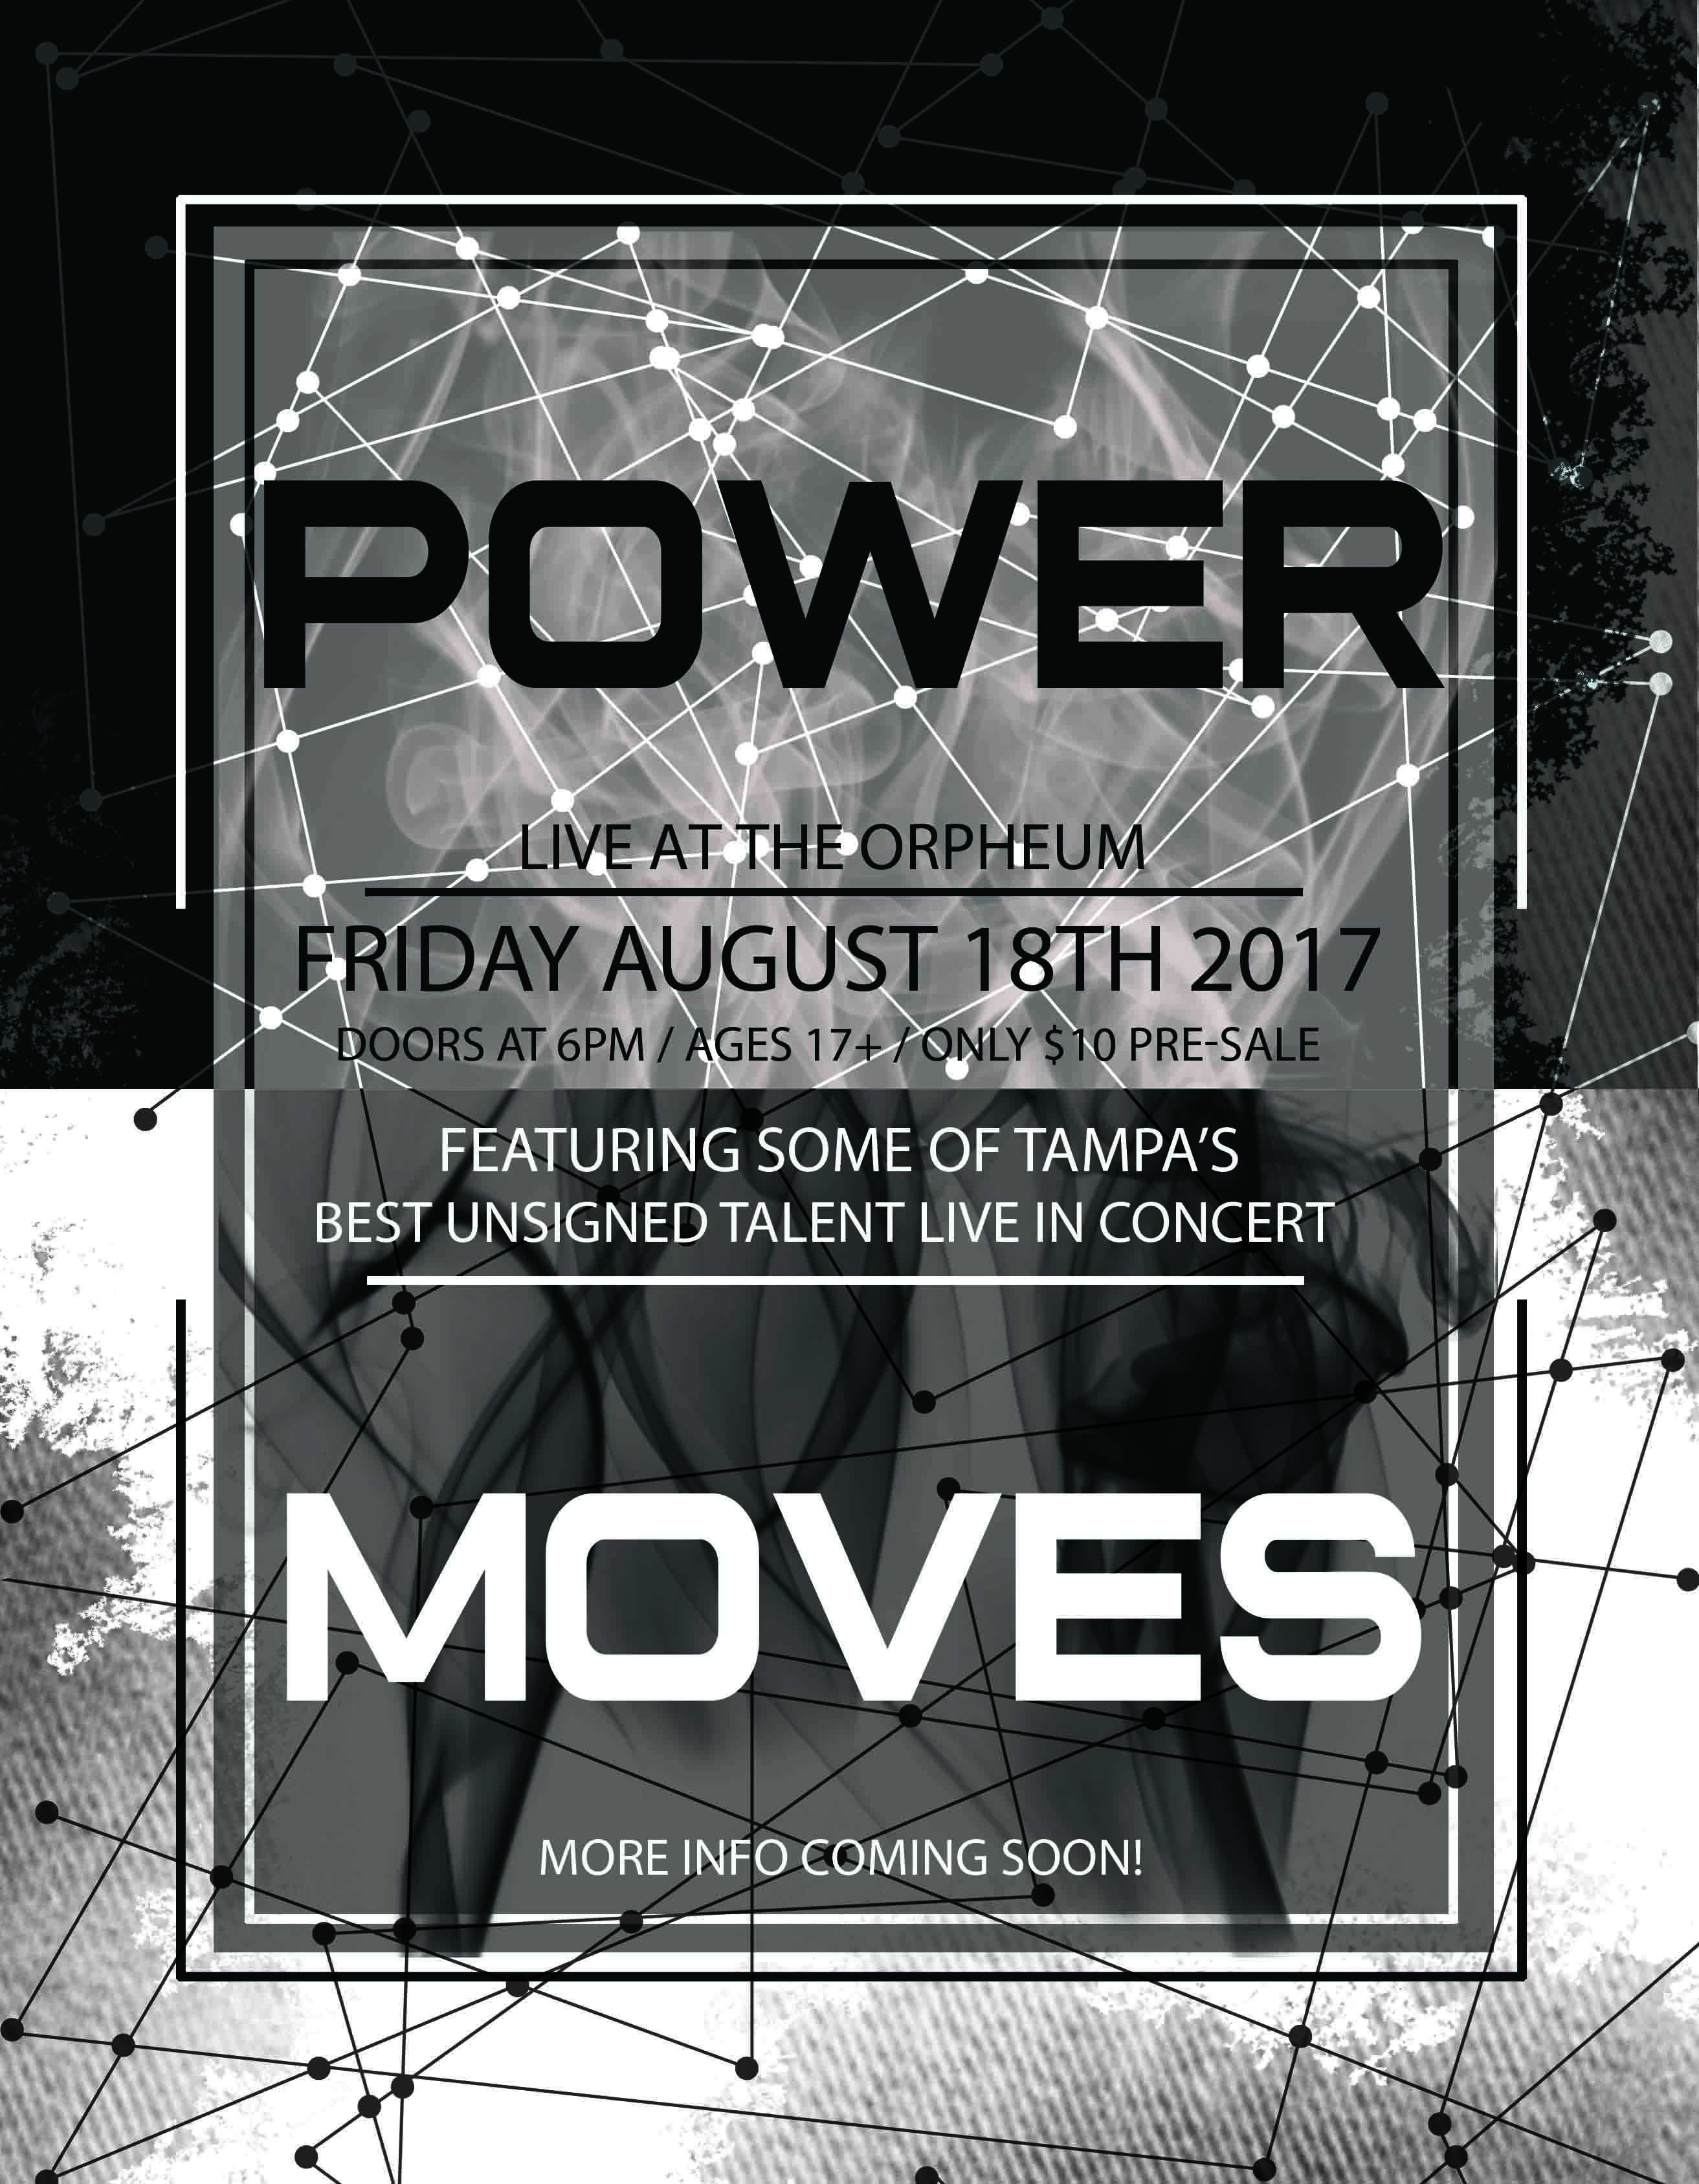 Power Moves Tour